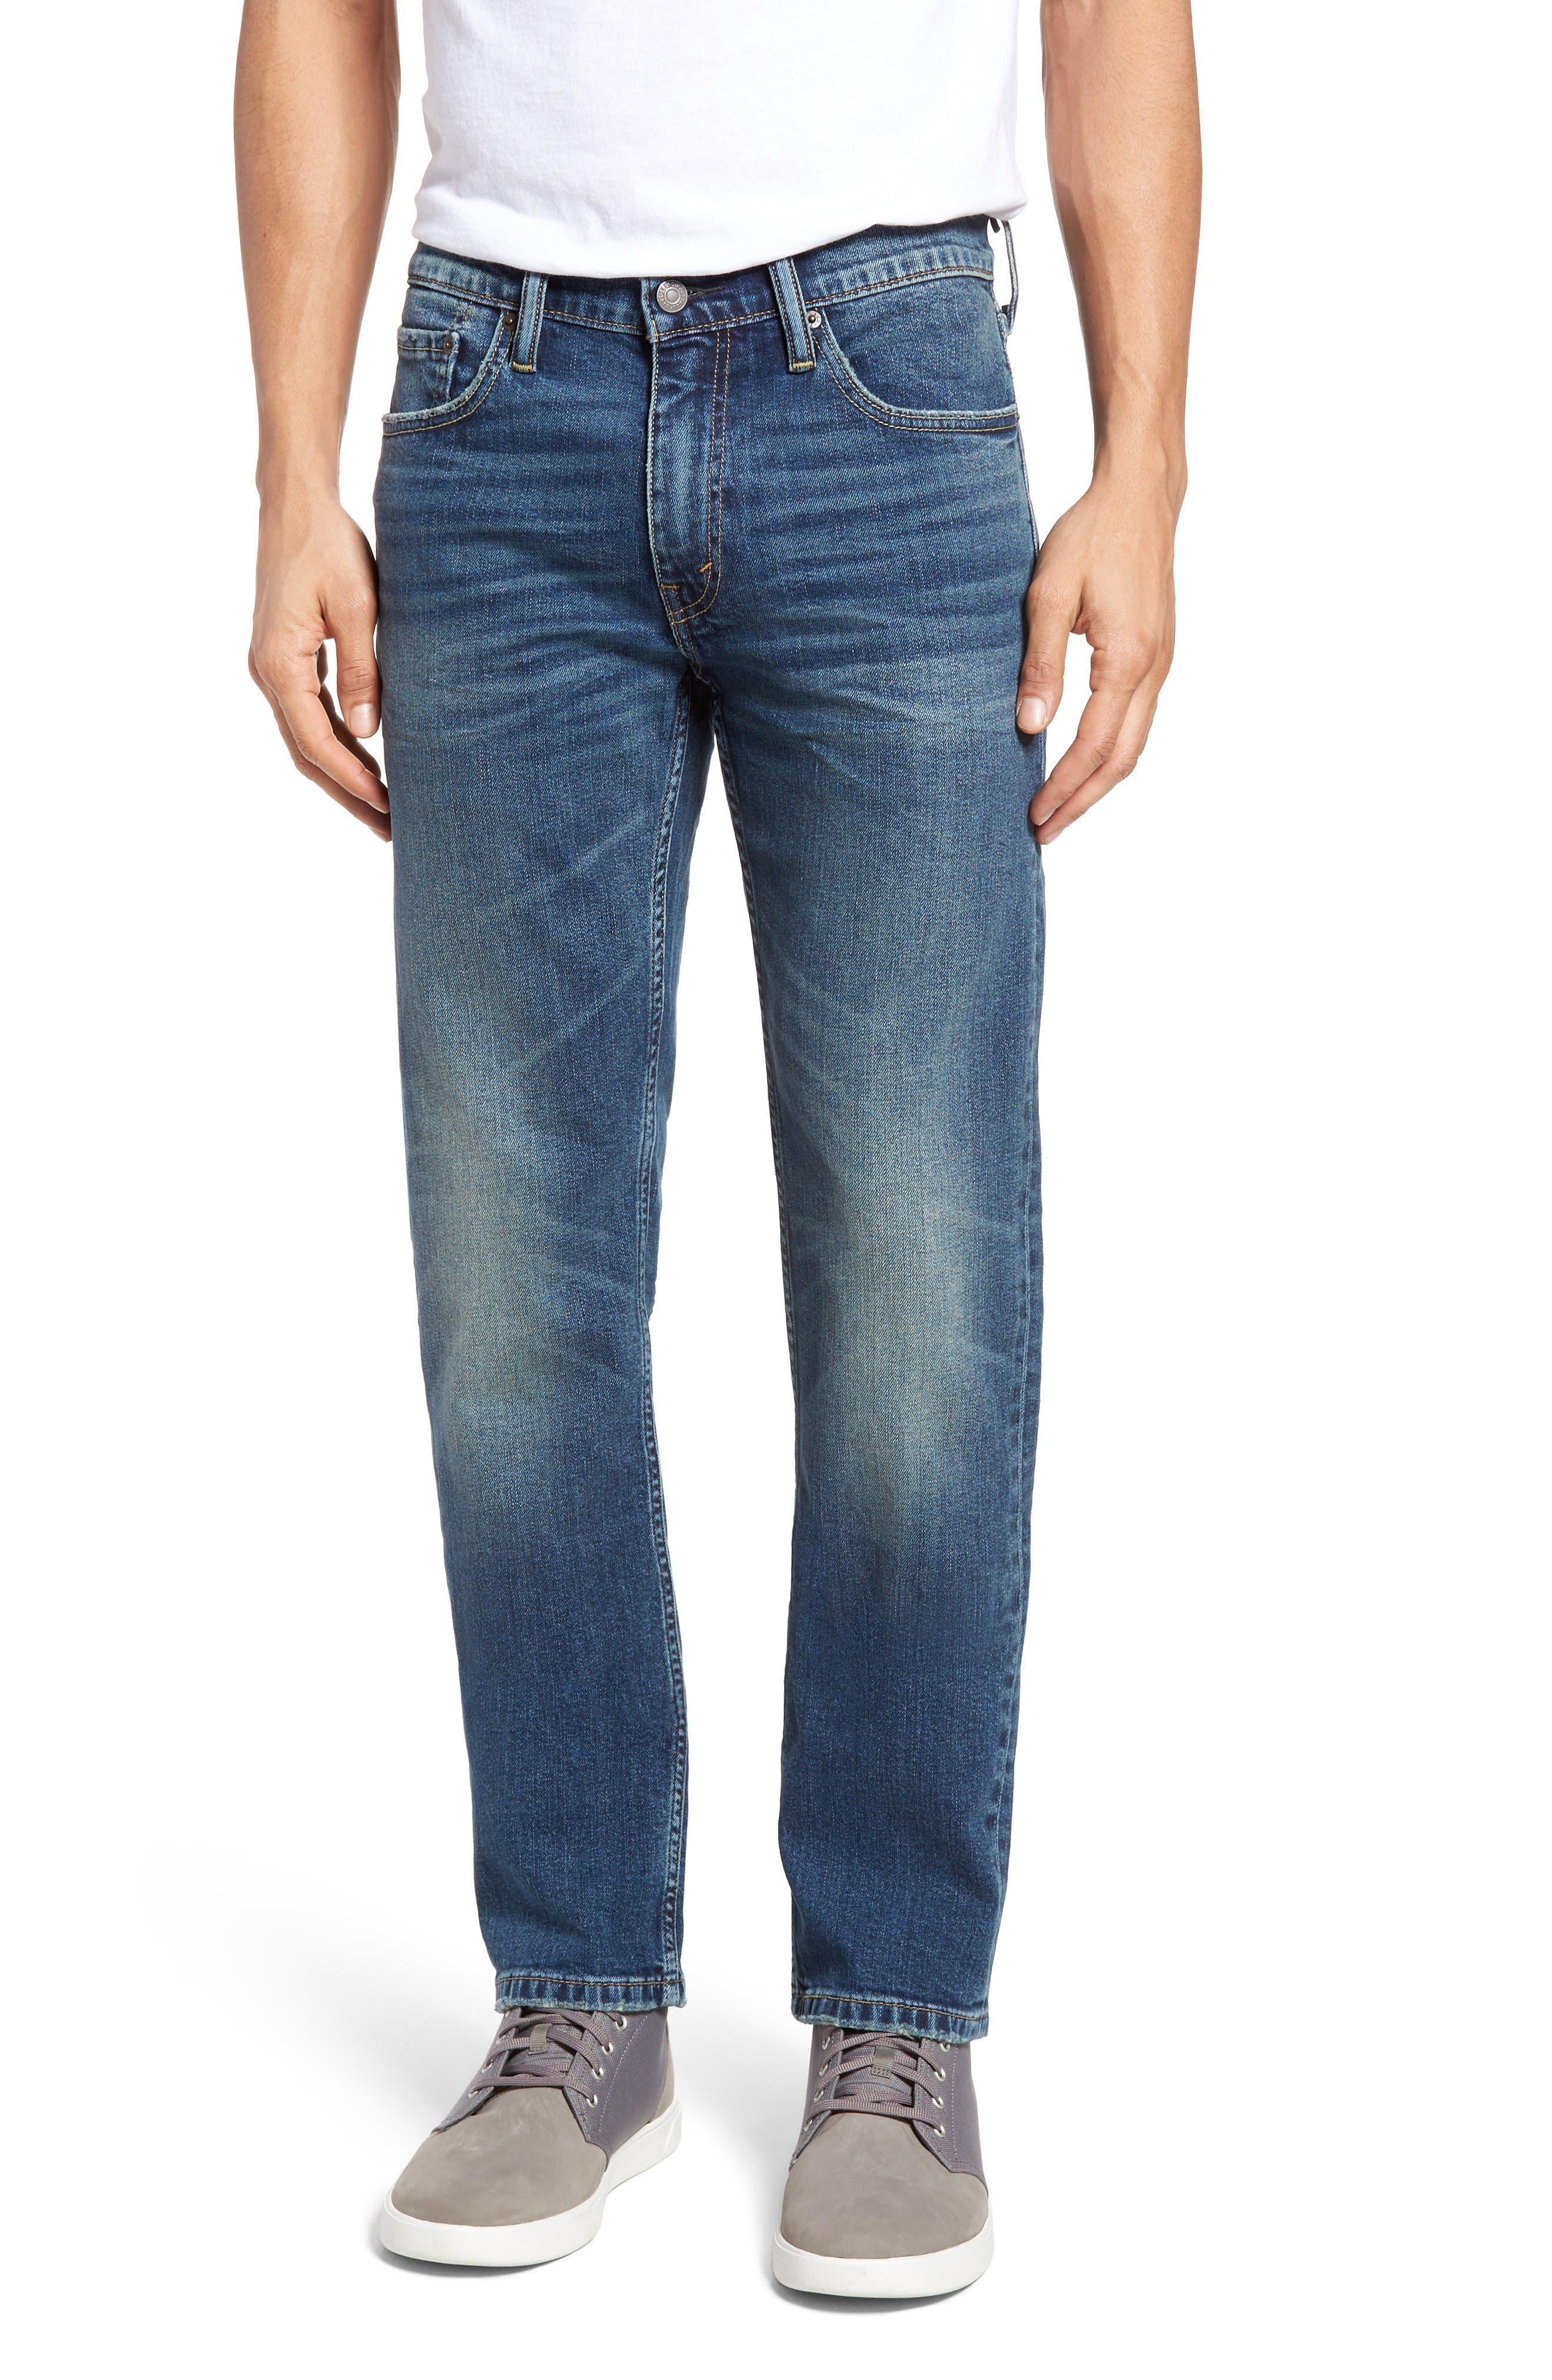 Alternate Image 1 Selected - Levi's® 511™ Slim Fit Jeans (Emgee)